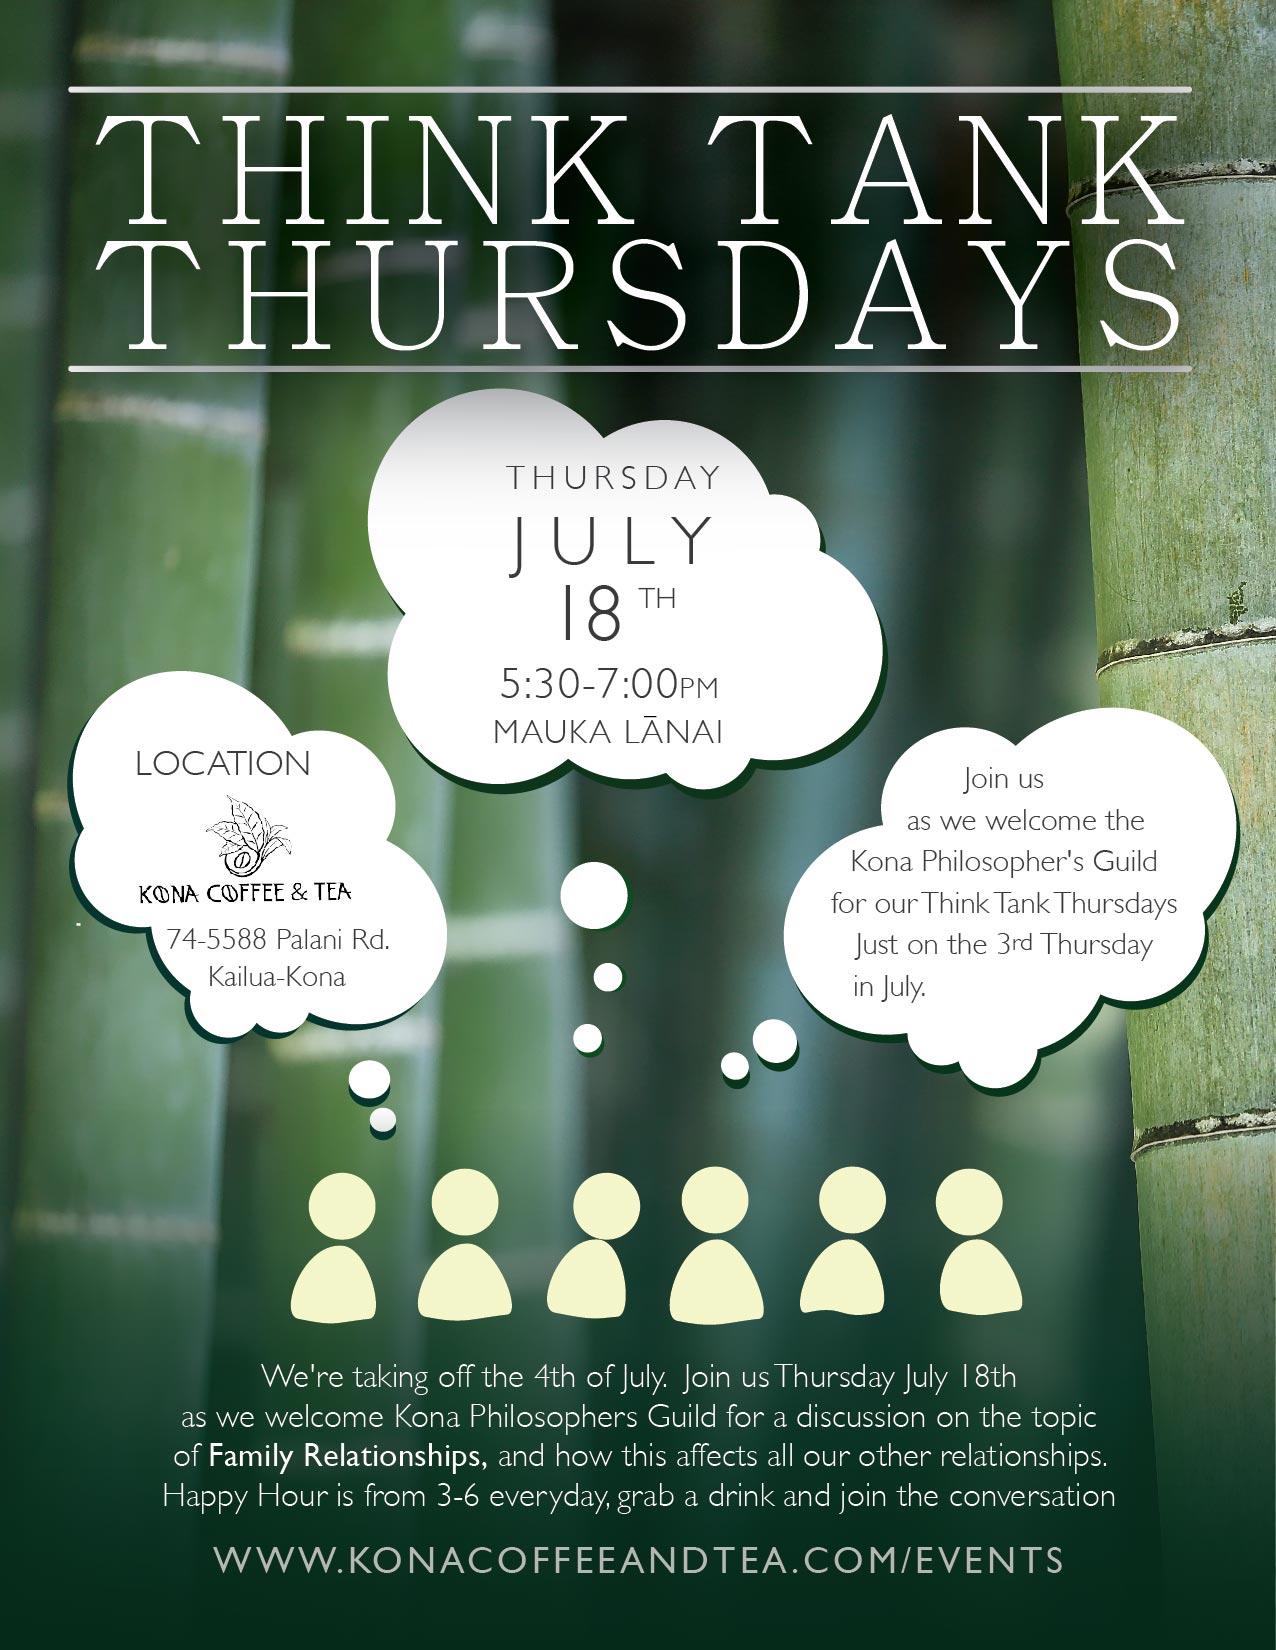 Web Flyer_Kona Philosophers Guild_July 2019 _KCTC poster-01-01-01-01.jpg